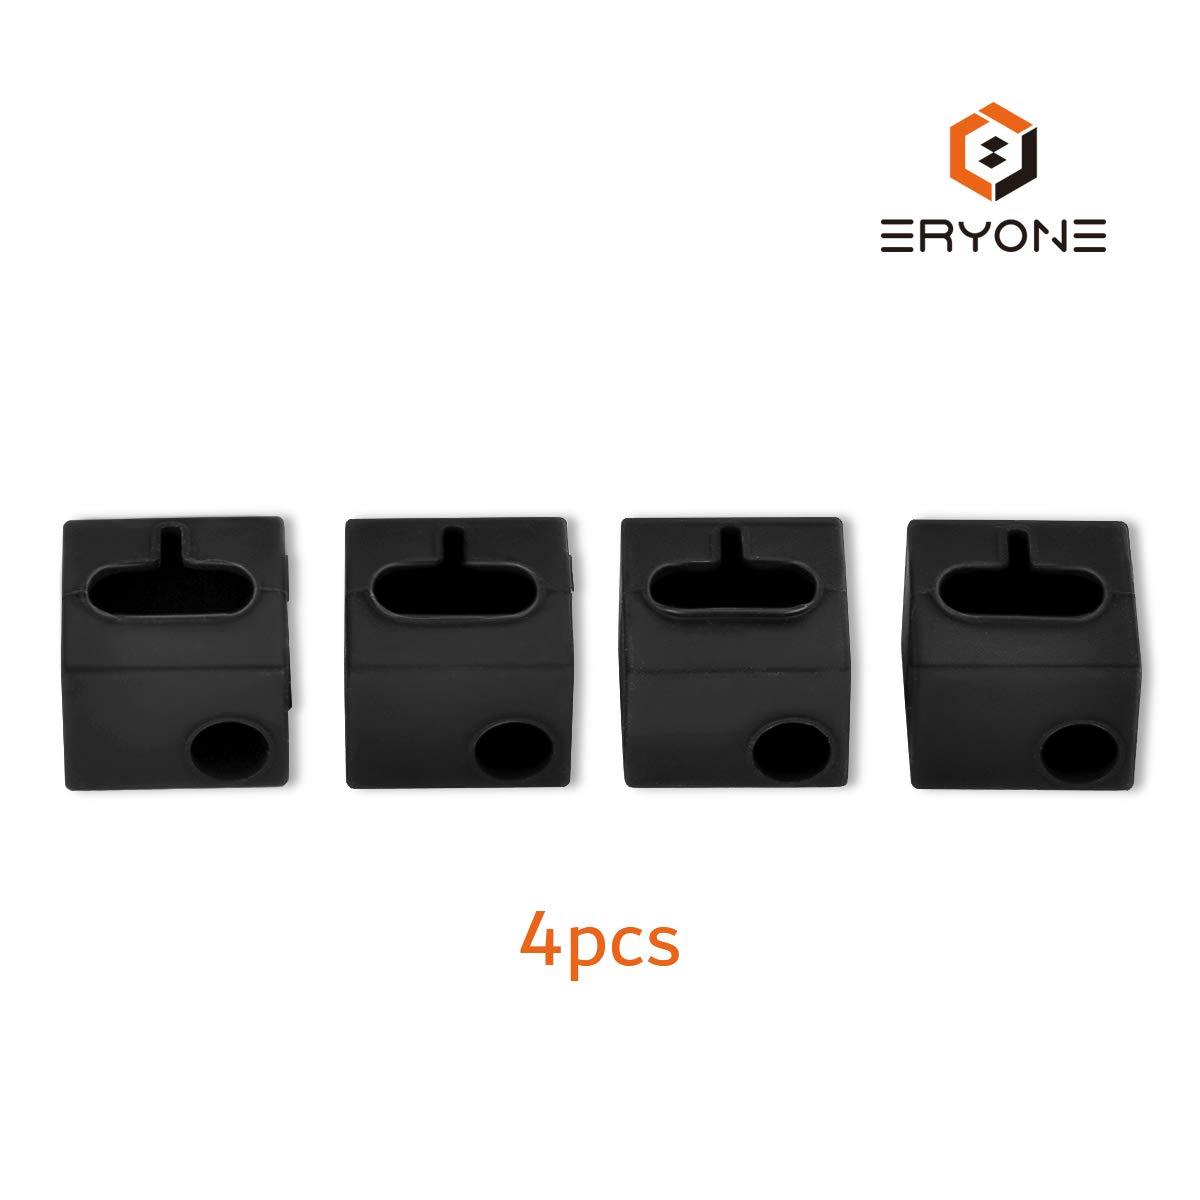 Eryone Heated Block Silicon Socks